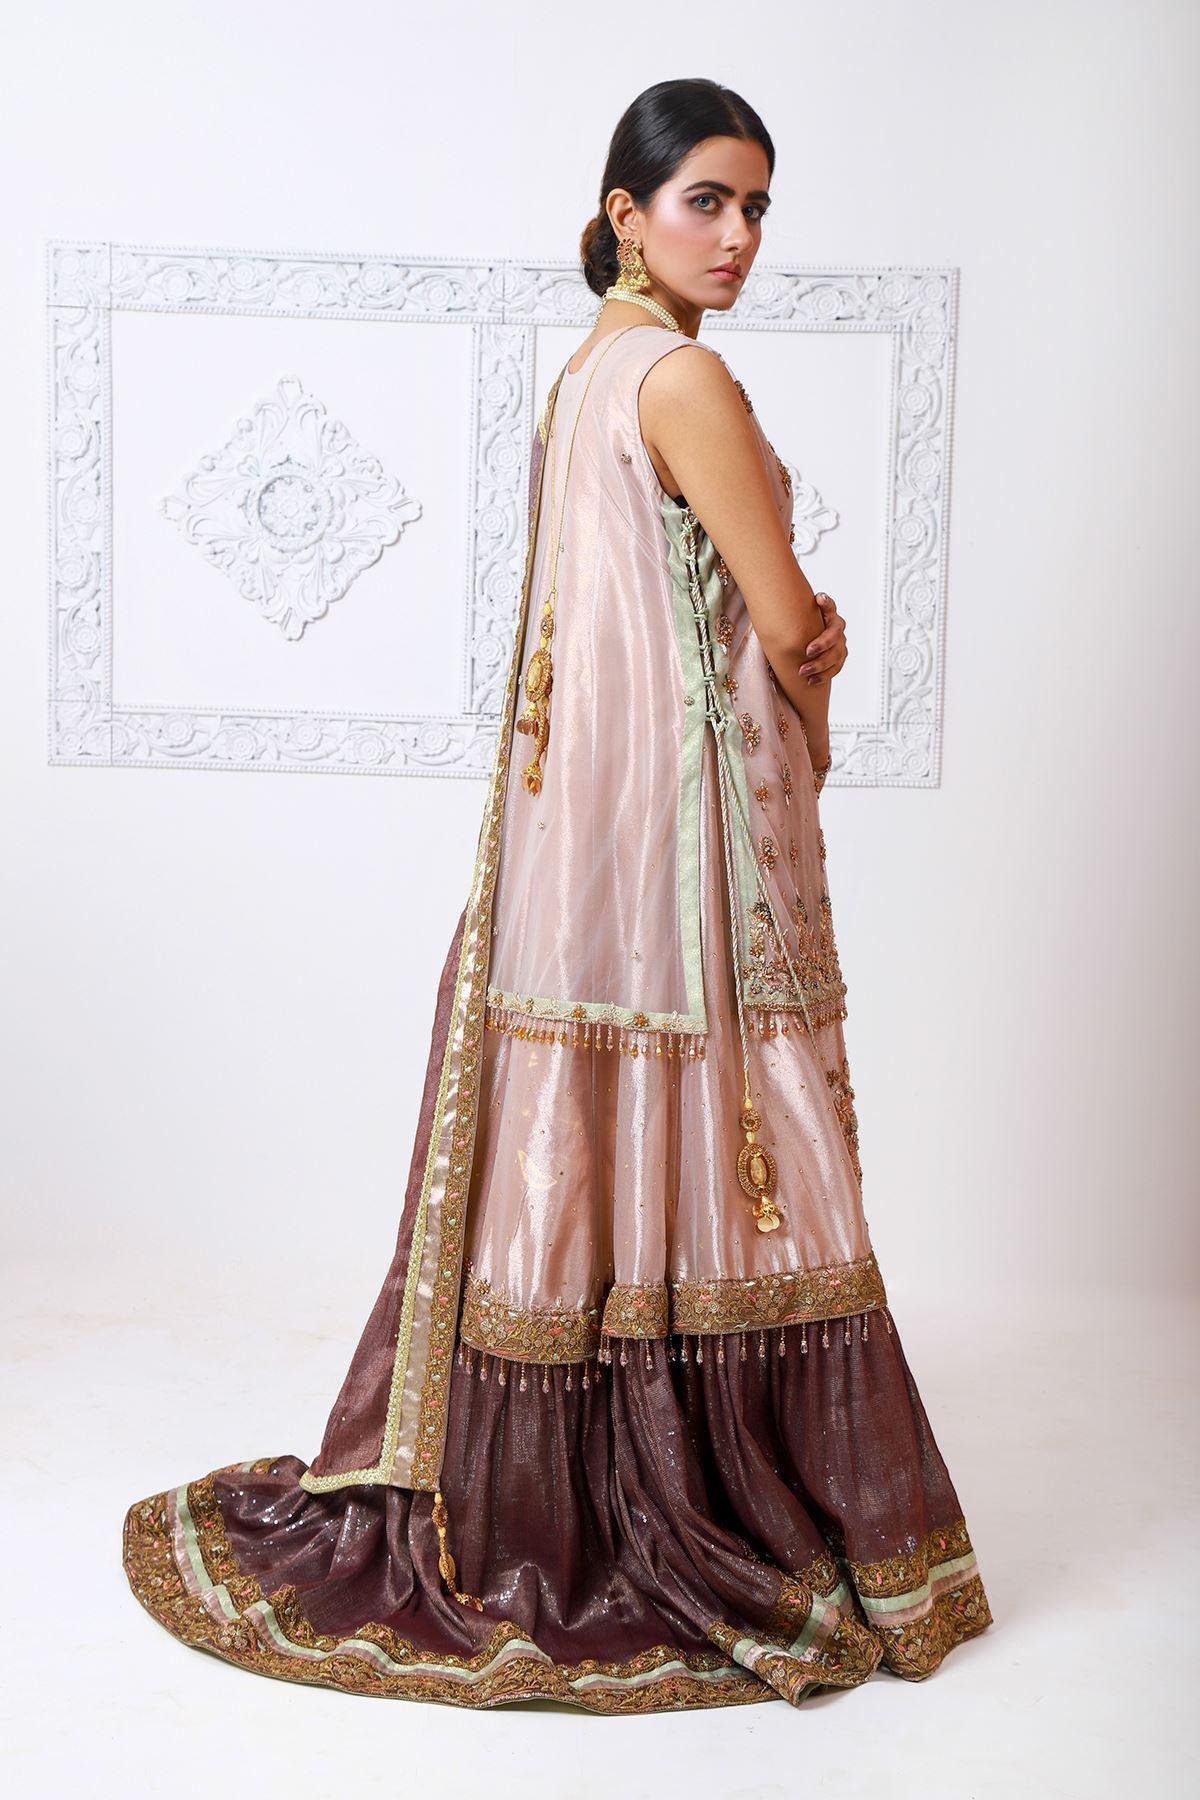 Moazzam Khan Formal 3PC sharara shirt and dupatta in Pink for women